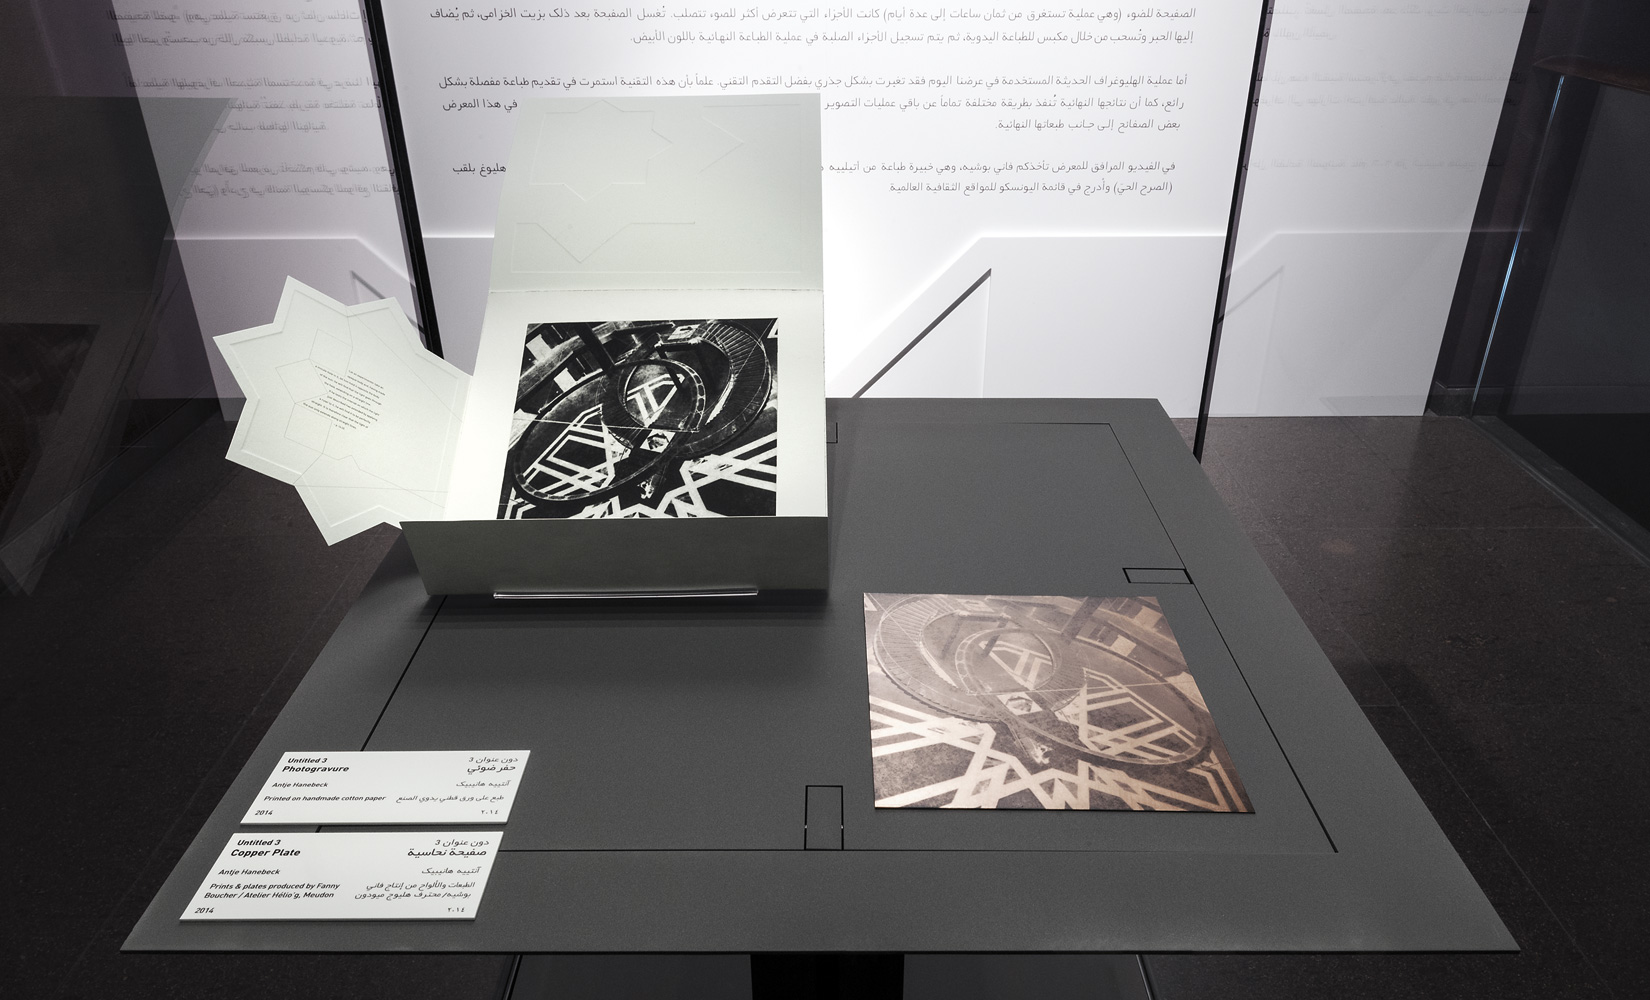 Radiant-expo6.jpg